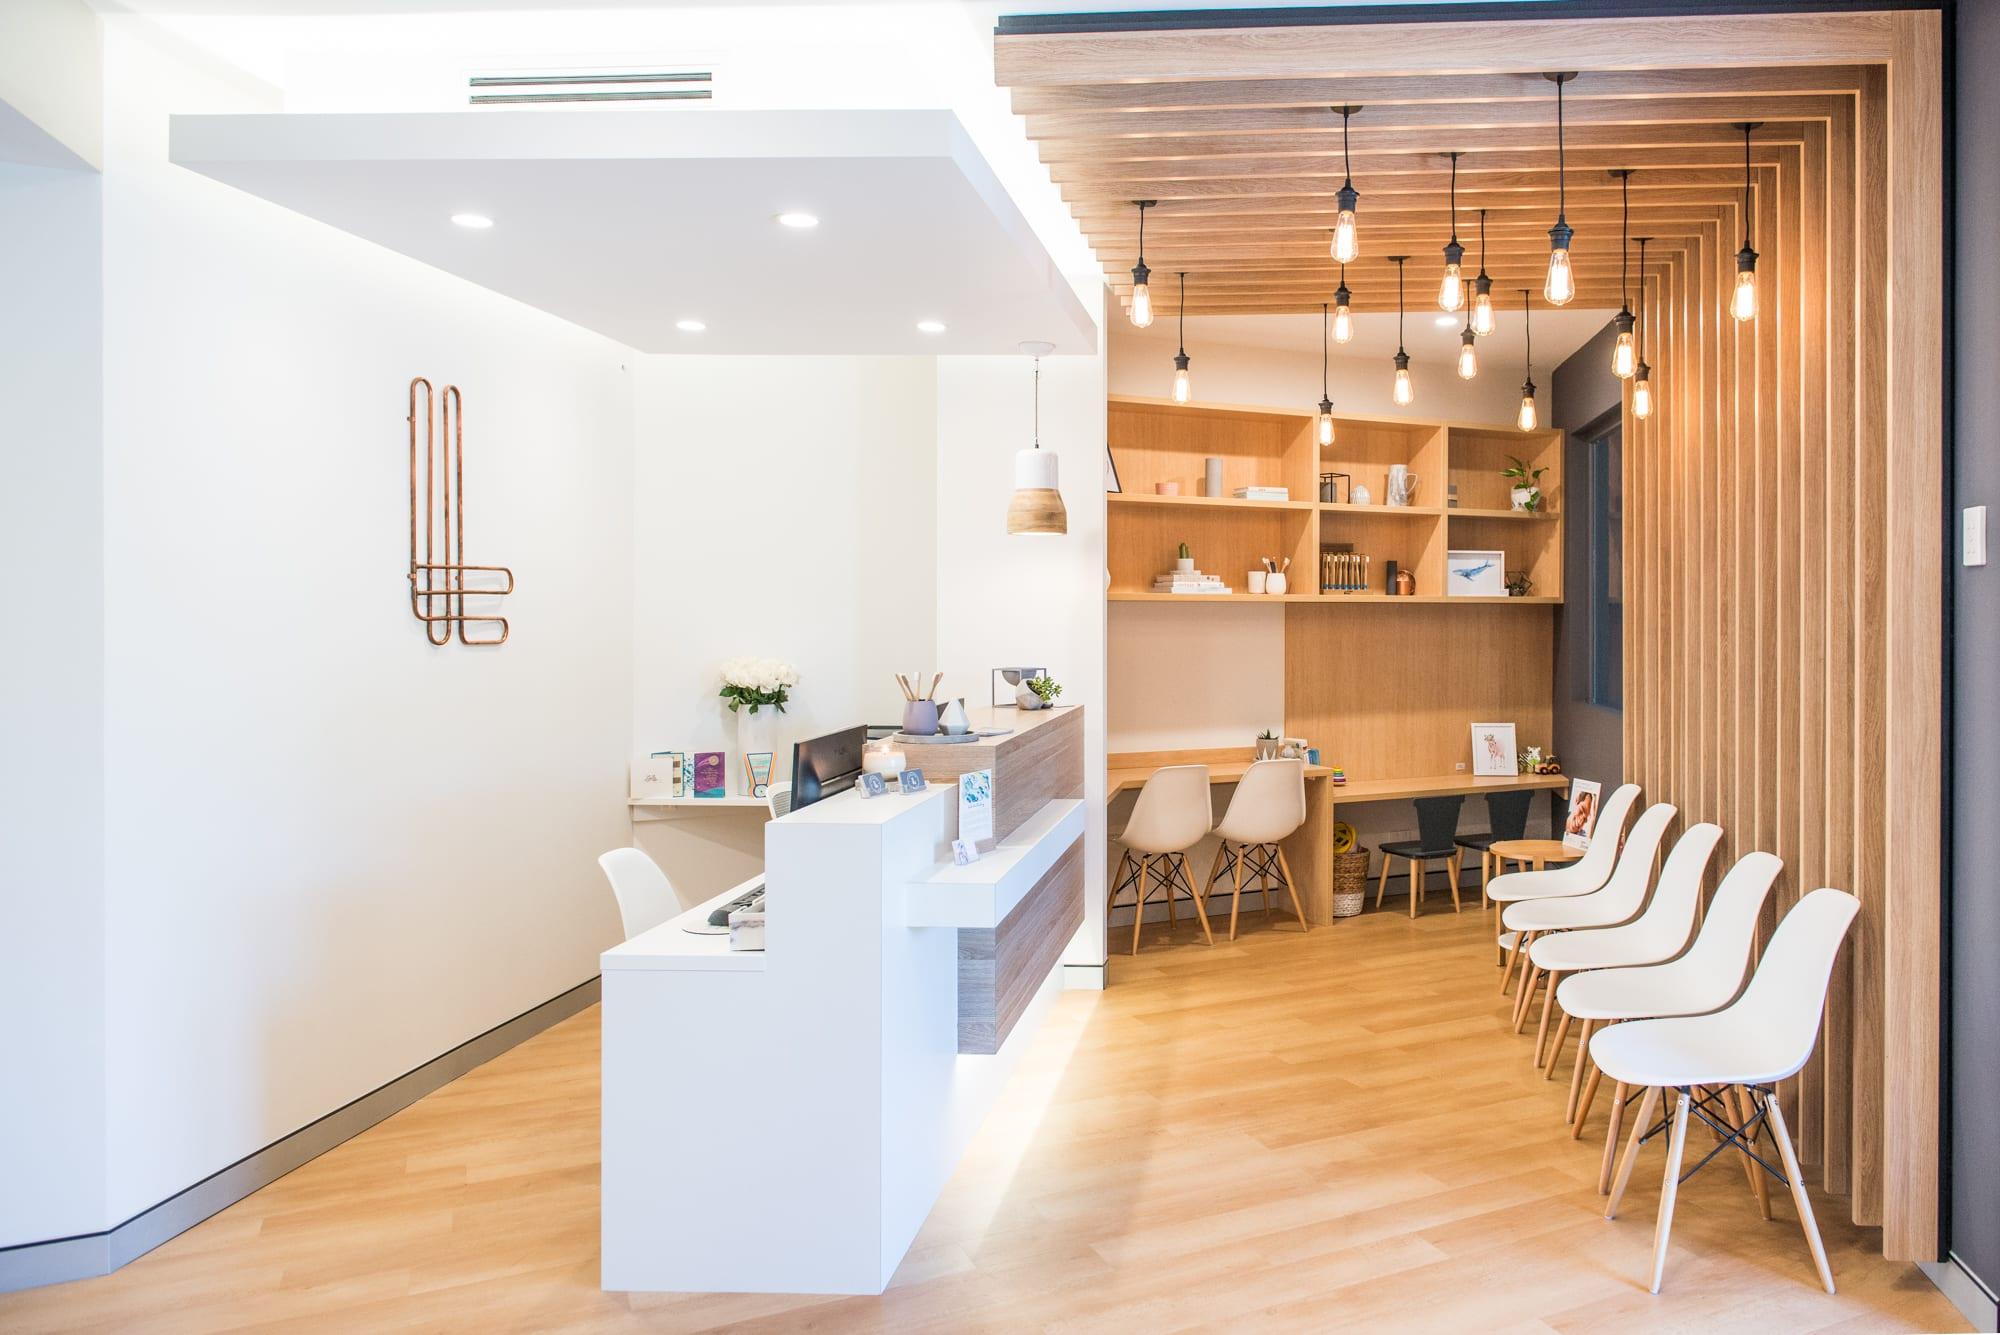 architect sydney central coast architecture residential interiors design 09.jpg